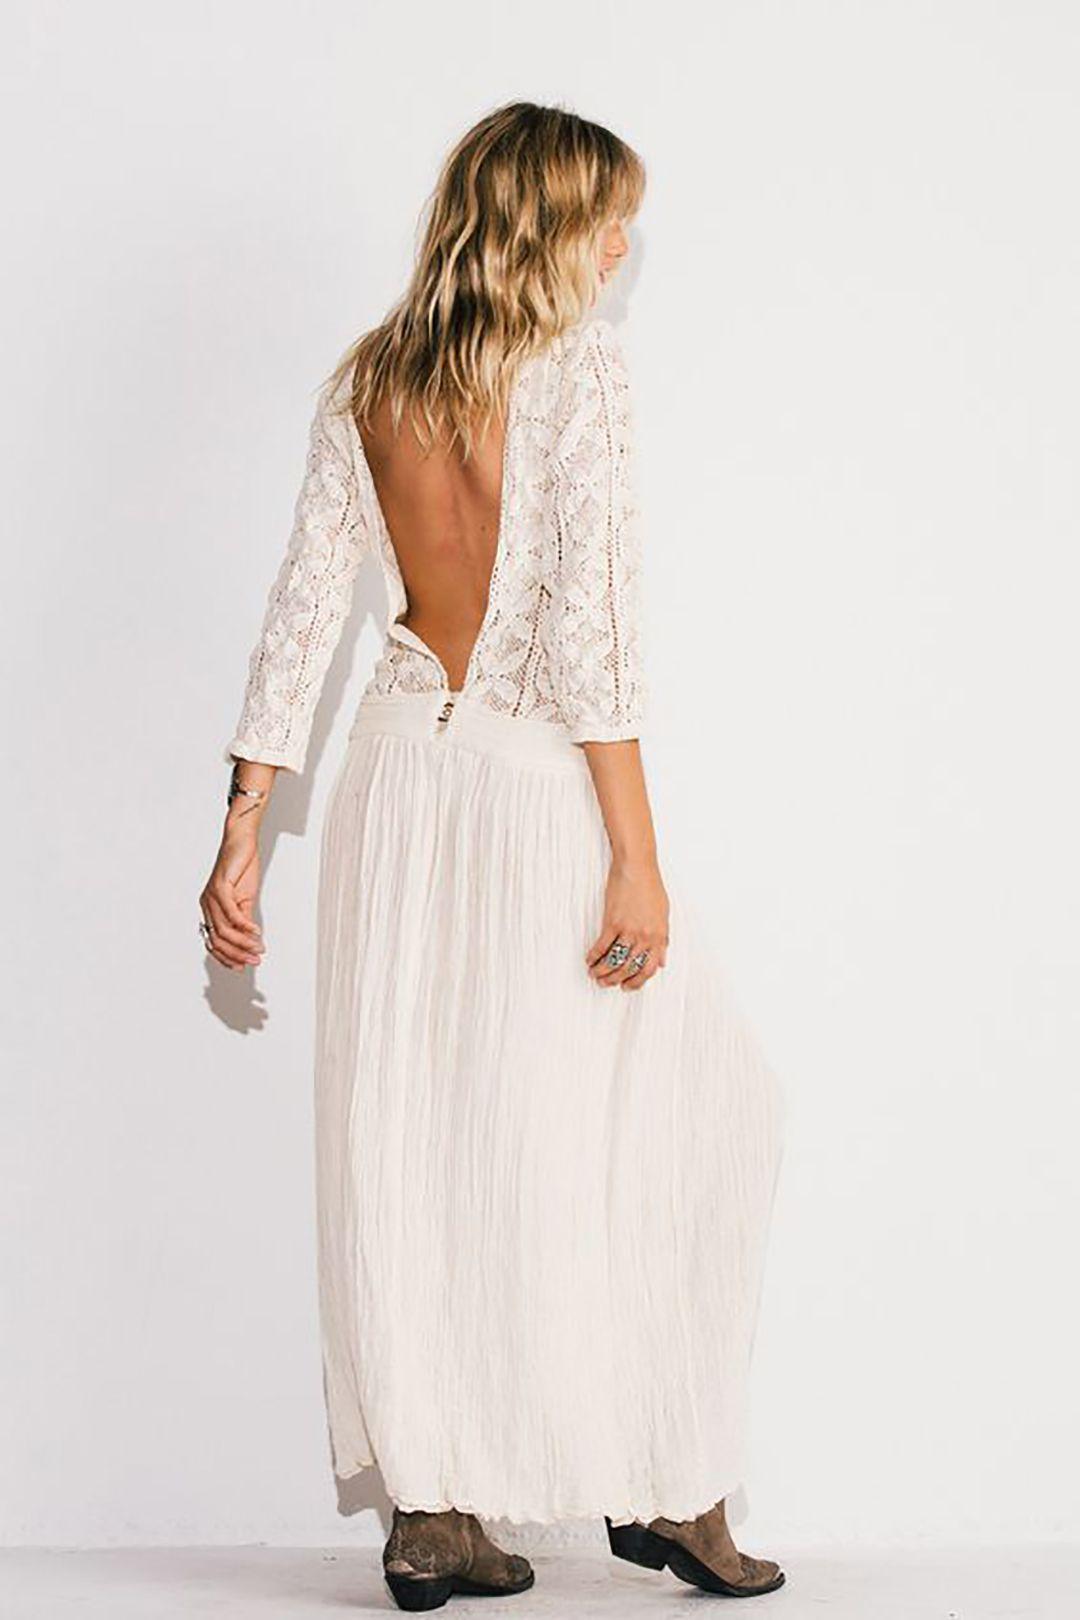 FESTIVAL BRIDES | Our Top 20 High Street Bridal Dresses for under £700